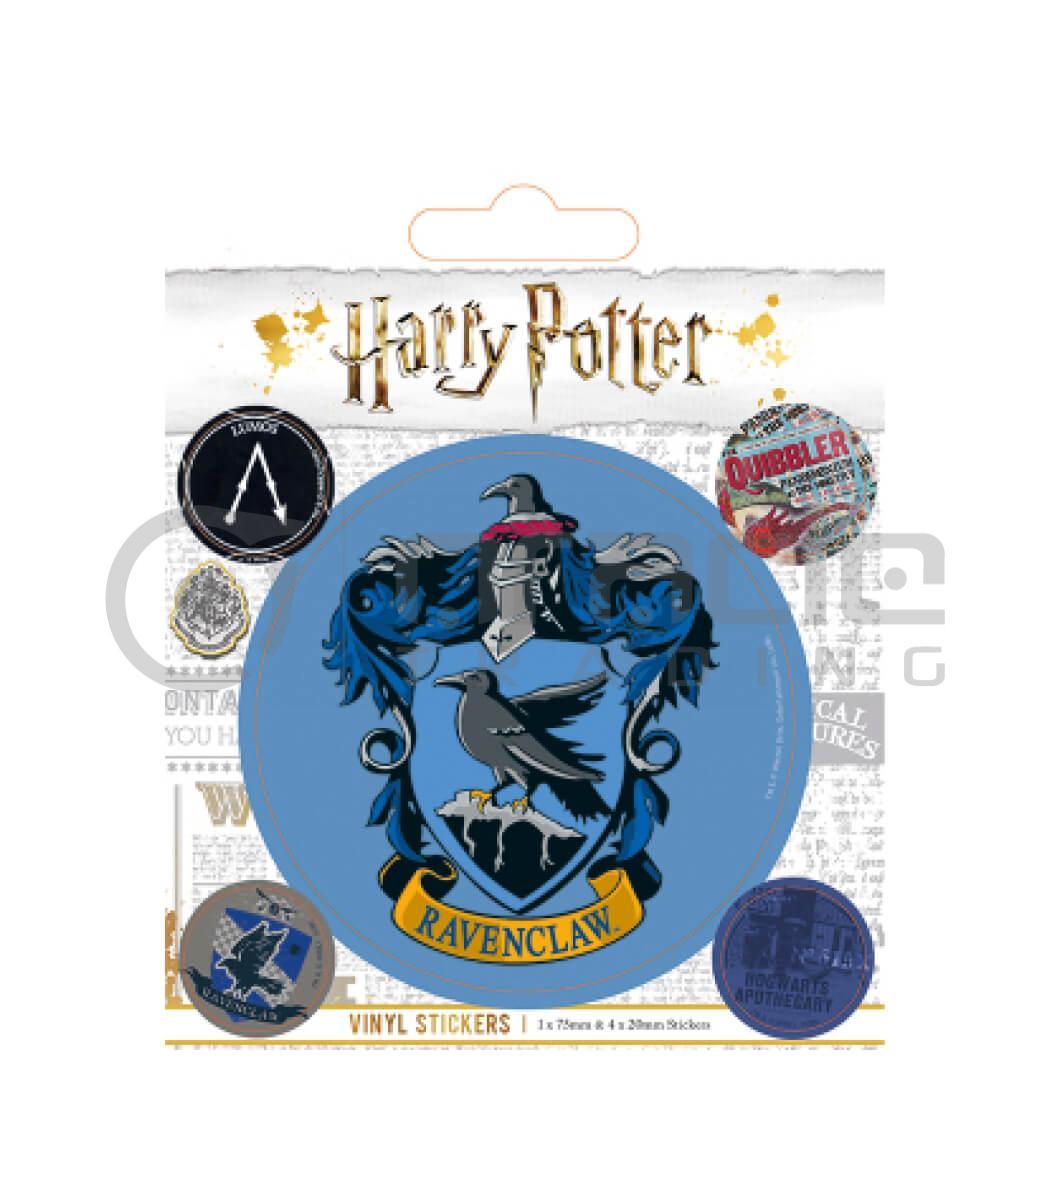 Harry Potter Ravenclaw Vinyl Sticker Pack